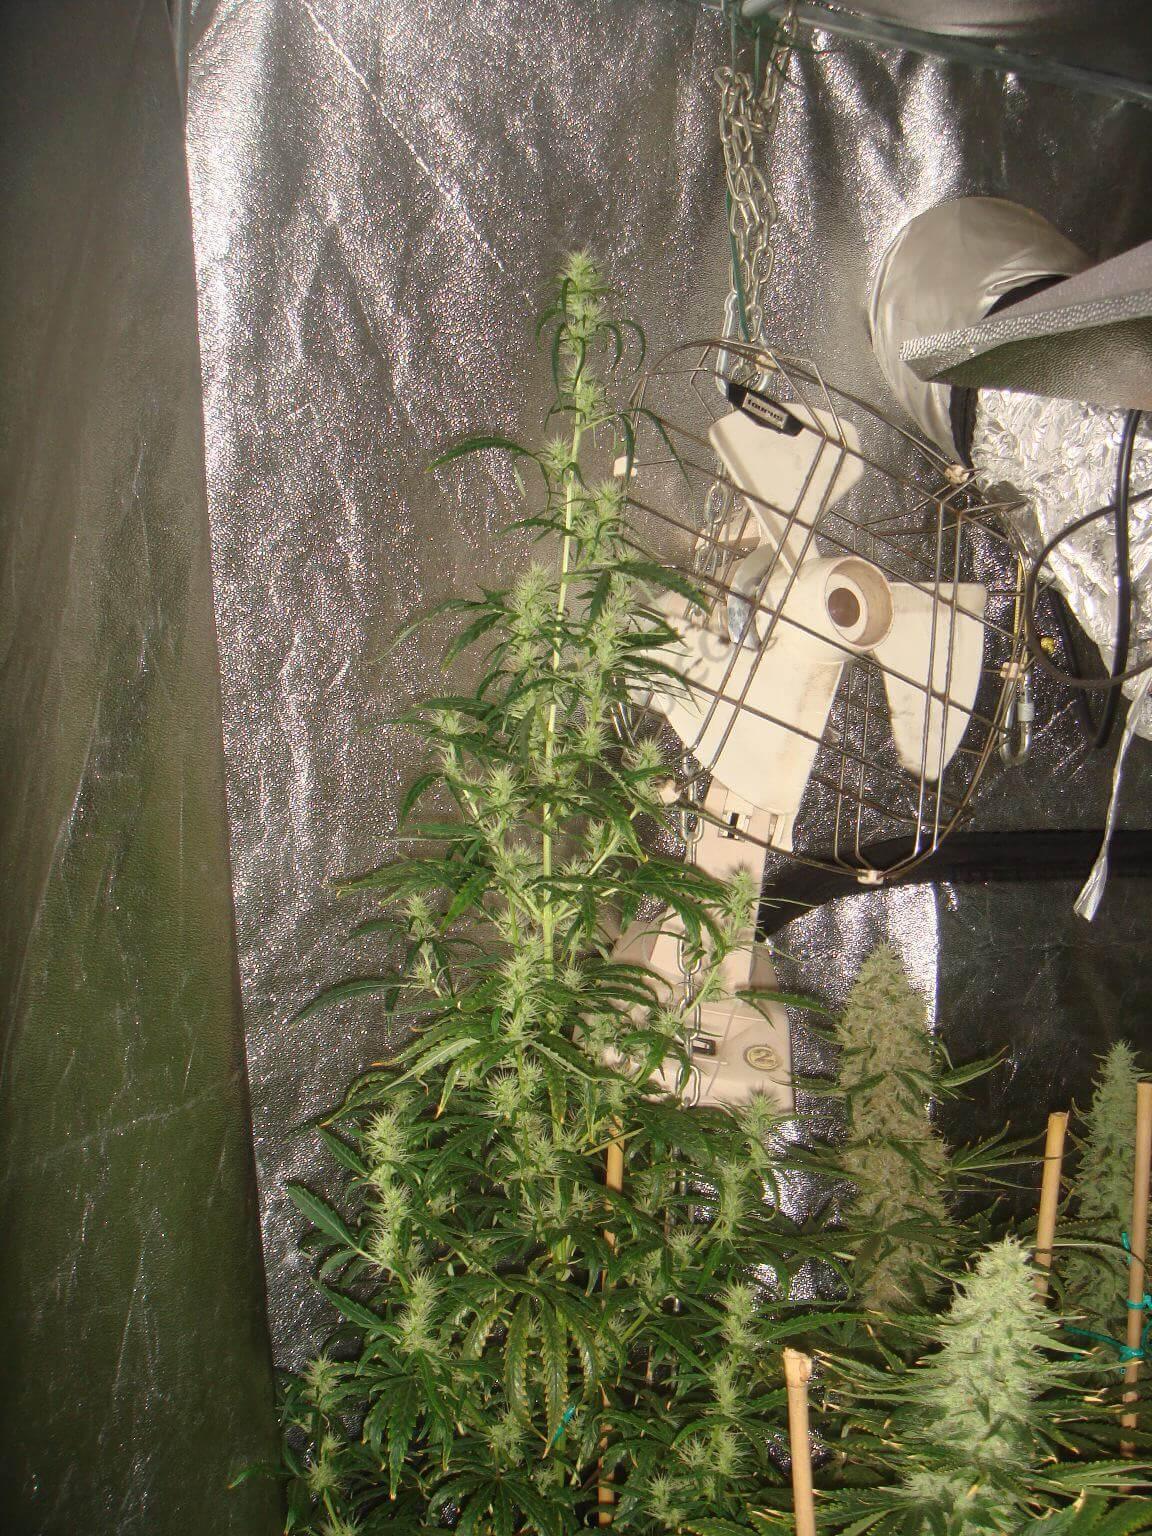 planta marihuana sativa a la izquierda